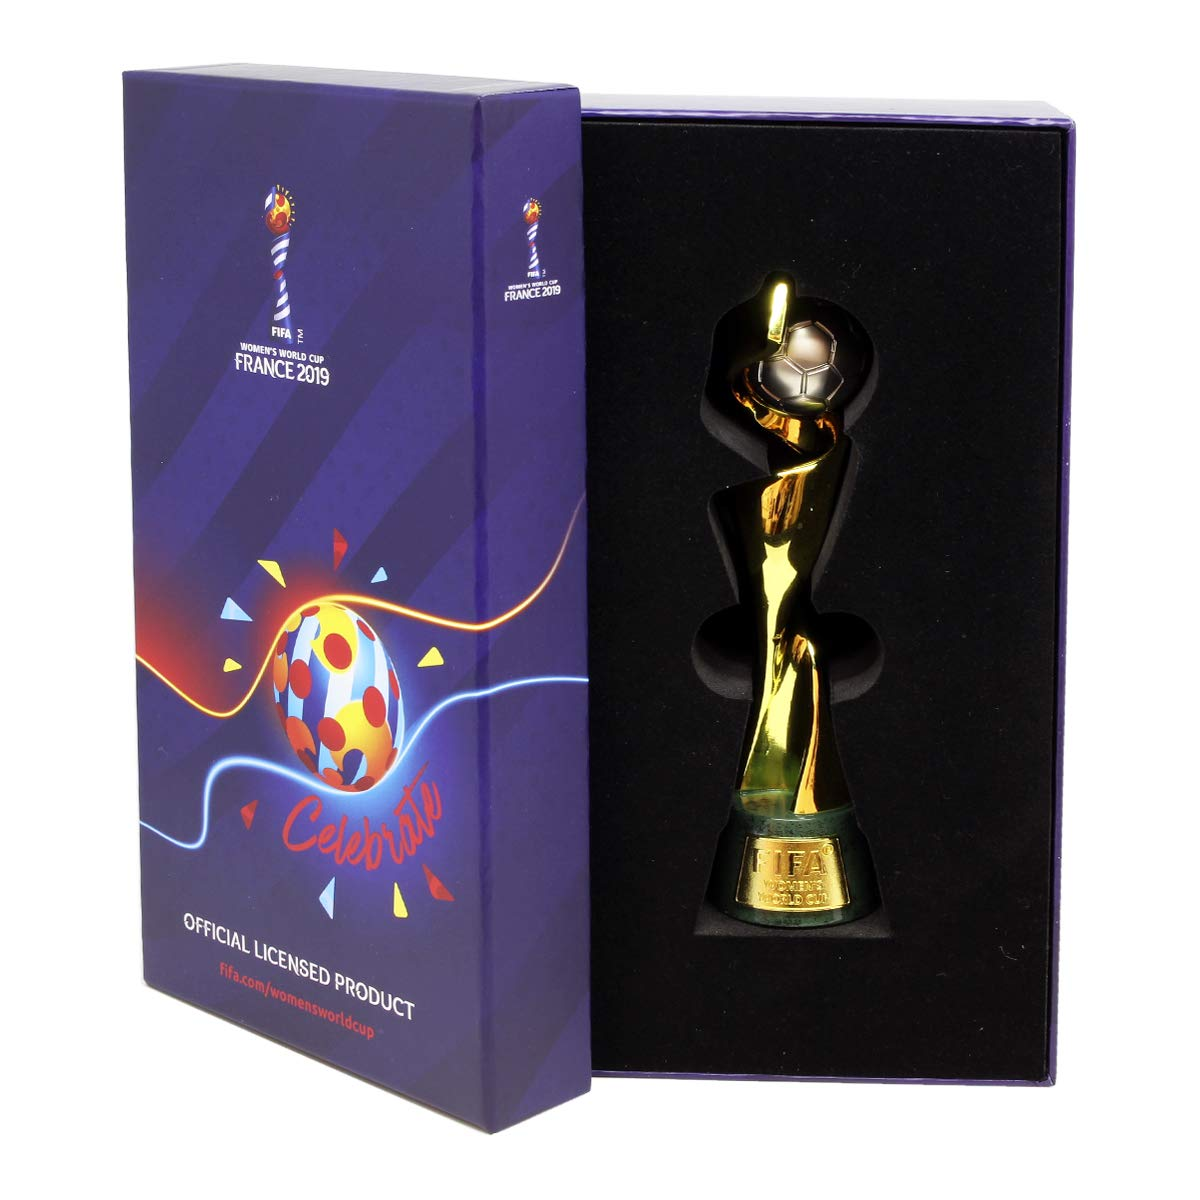 FIFA Womens World Cup France 2019/™ Replica-150mm Trophy Erwachsene Unisex One Size Nachbildung